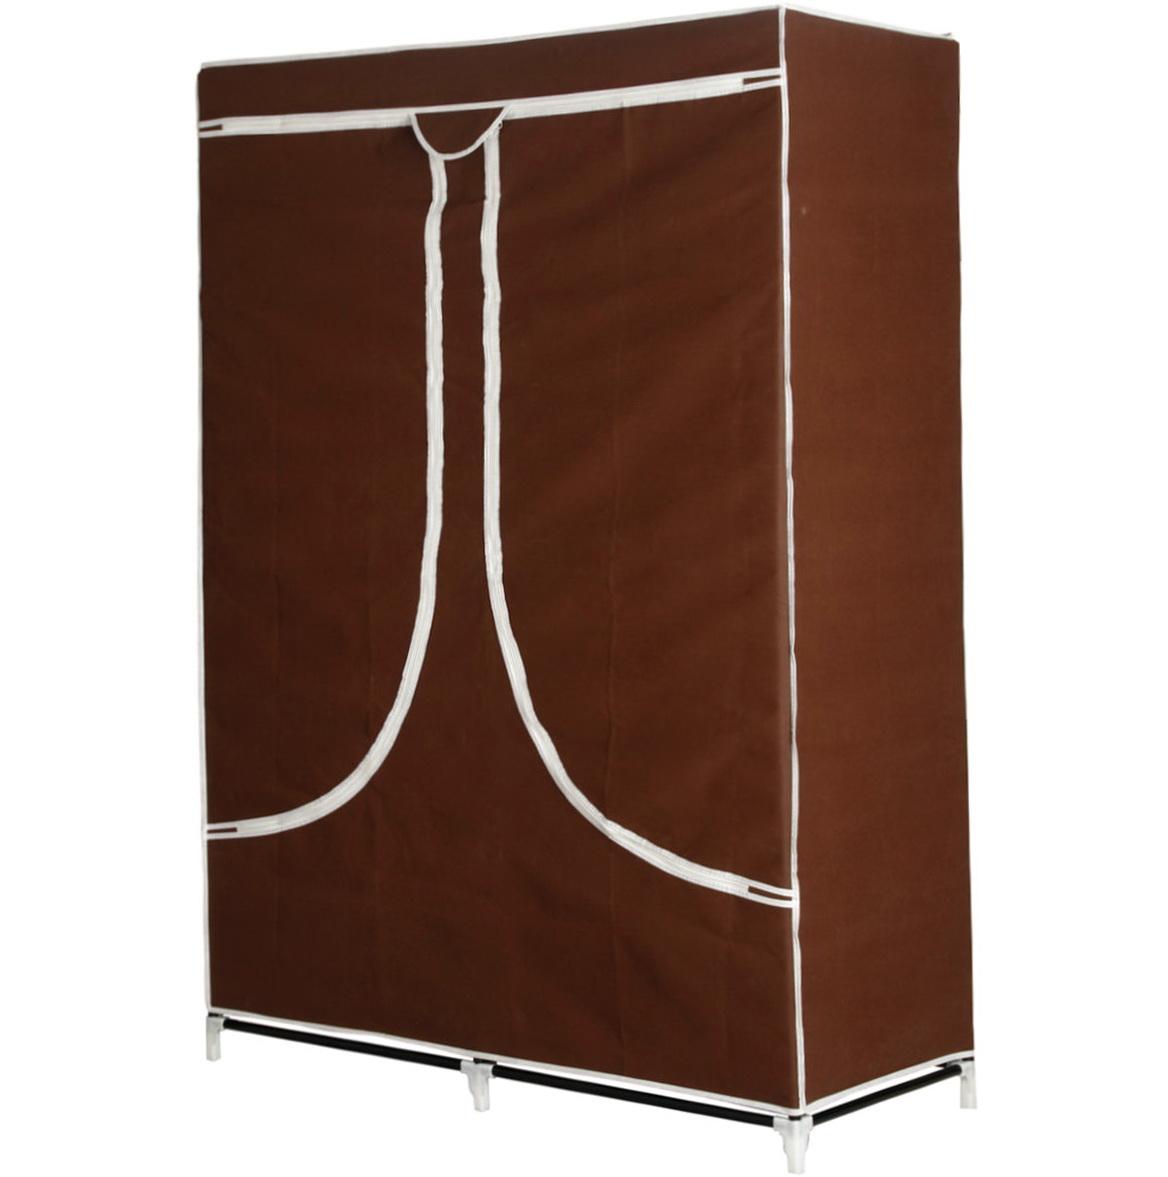 Portable Wardrobe Closet Walmart | Home Design Ideas